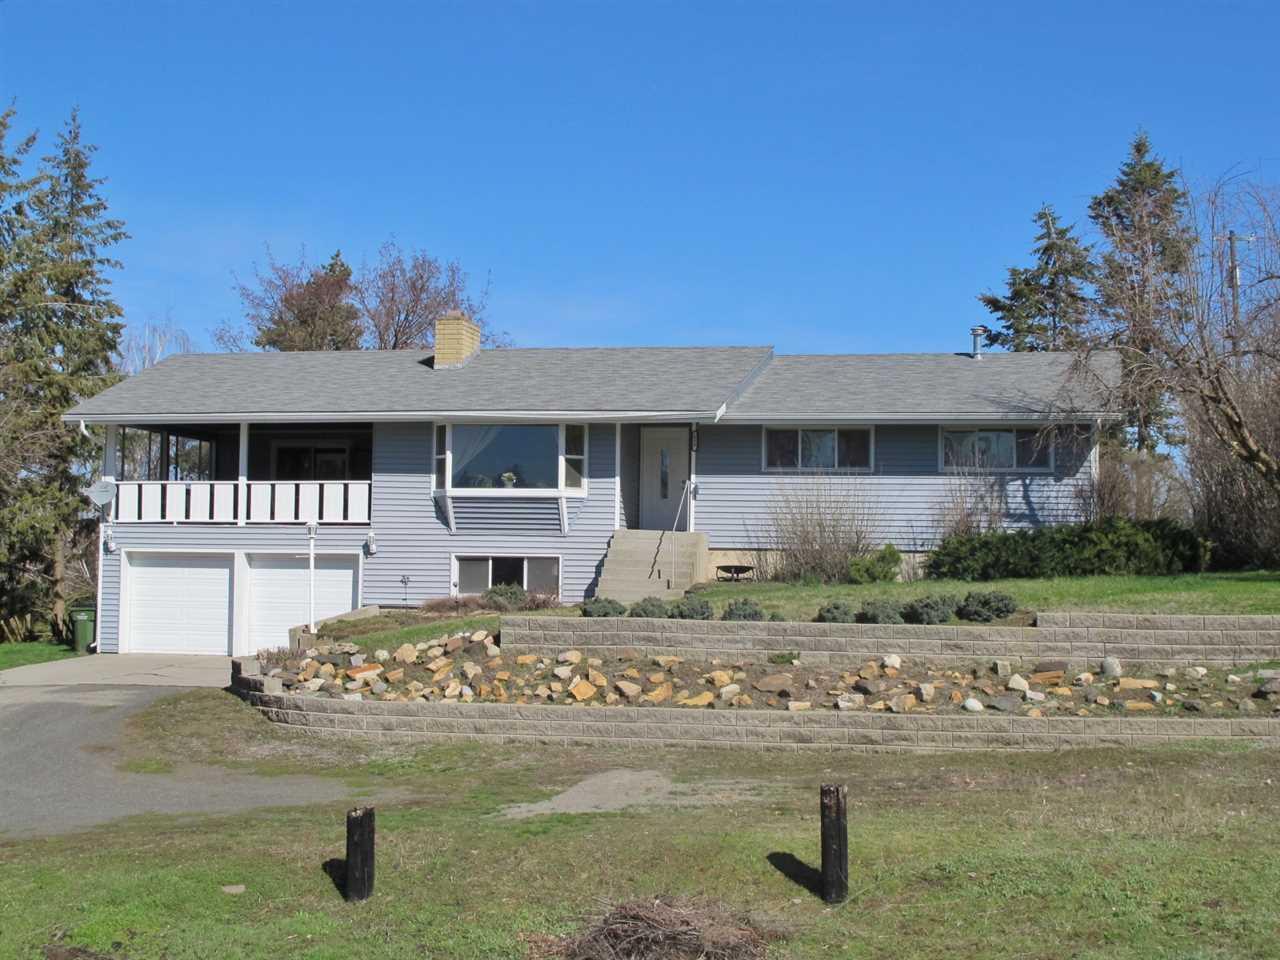 Single Family Home for Sale at 219 E 1st Street 219 E 1st Street Rosalia, Washington 99170 United States